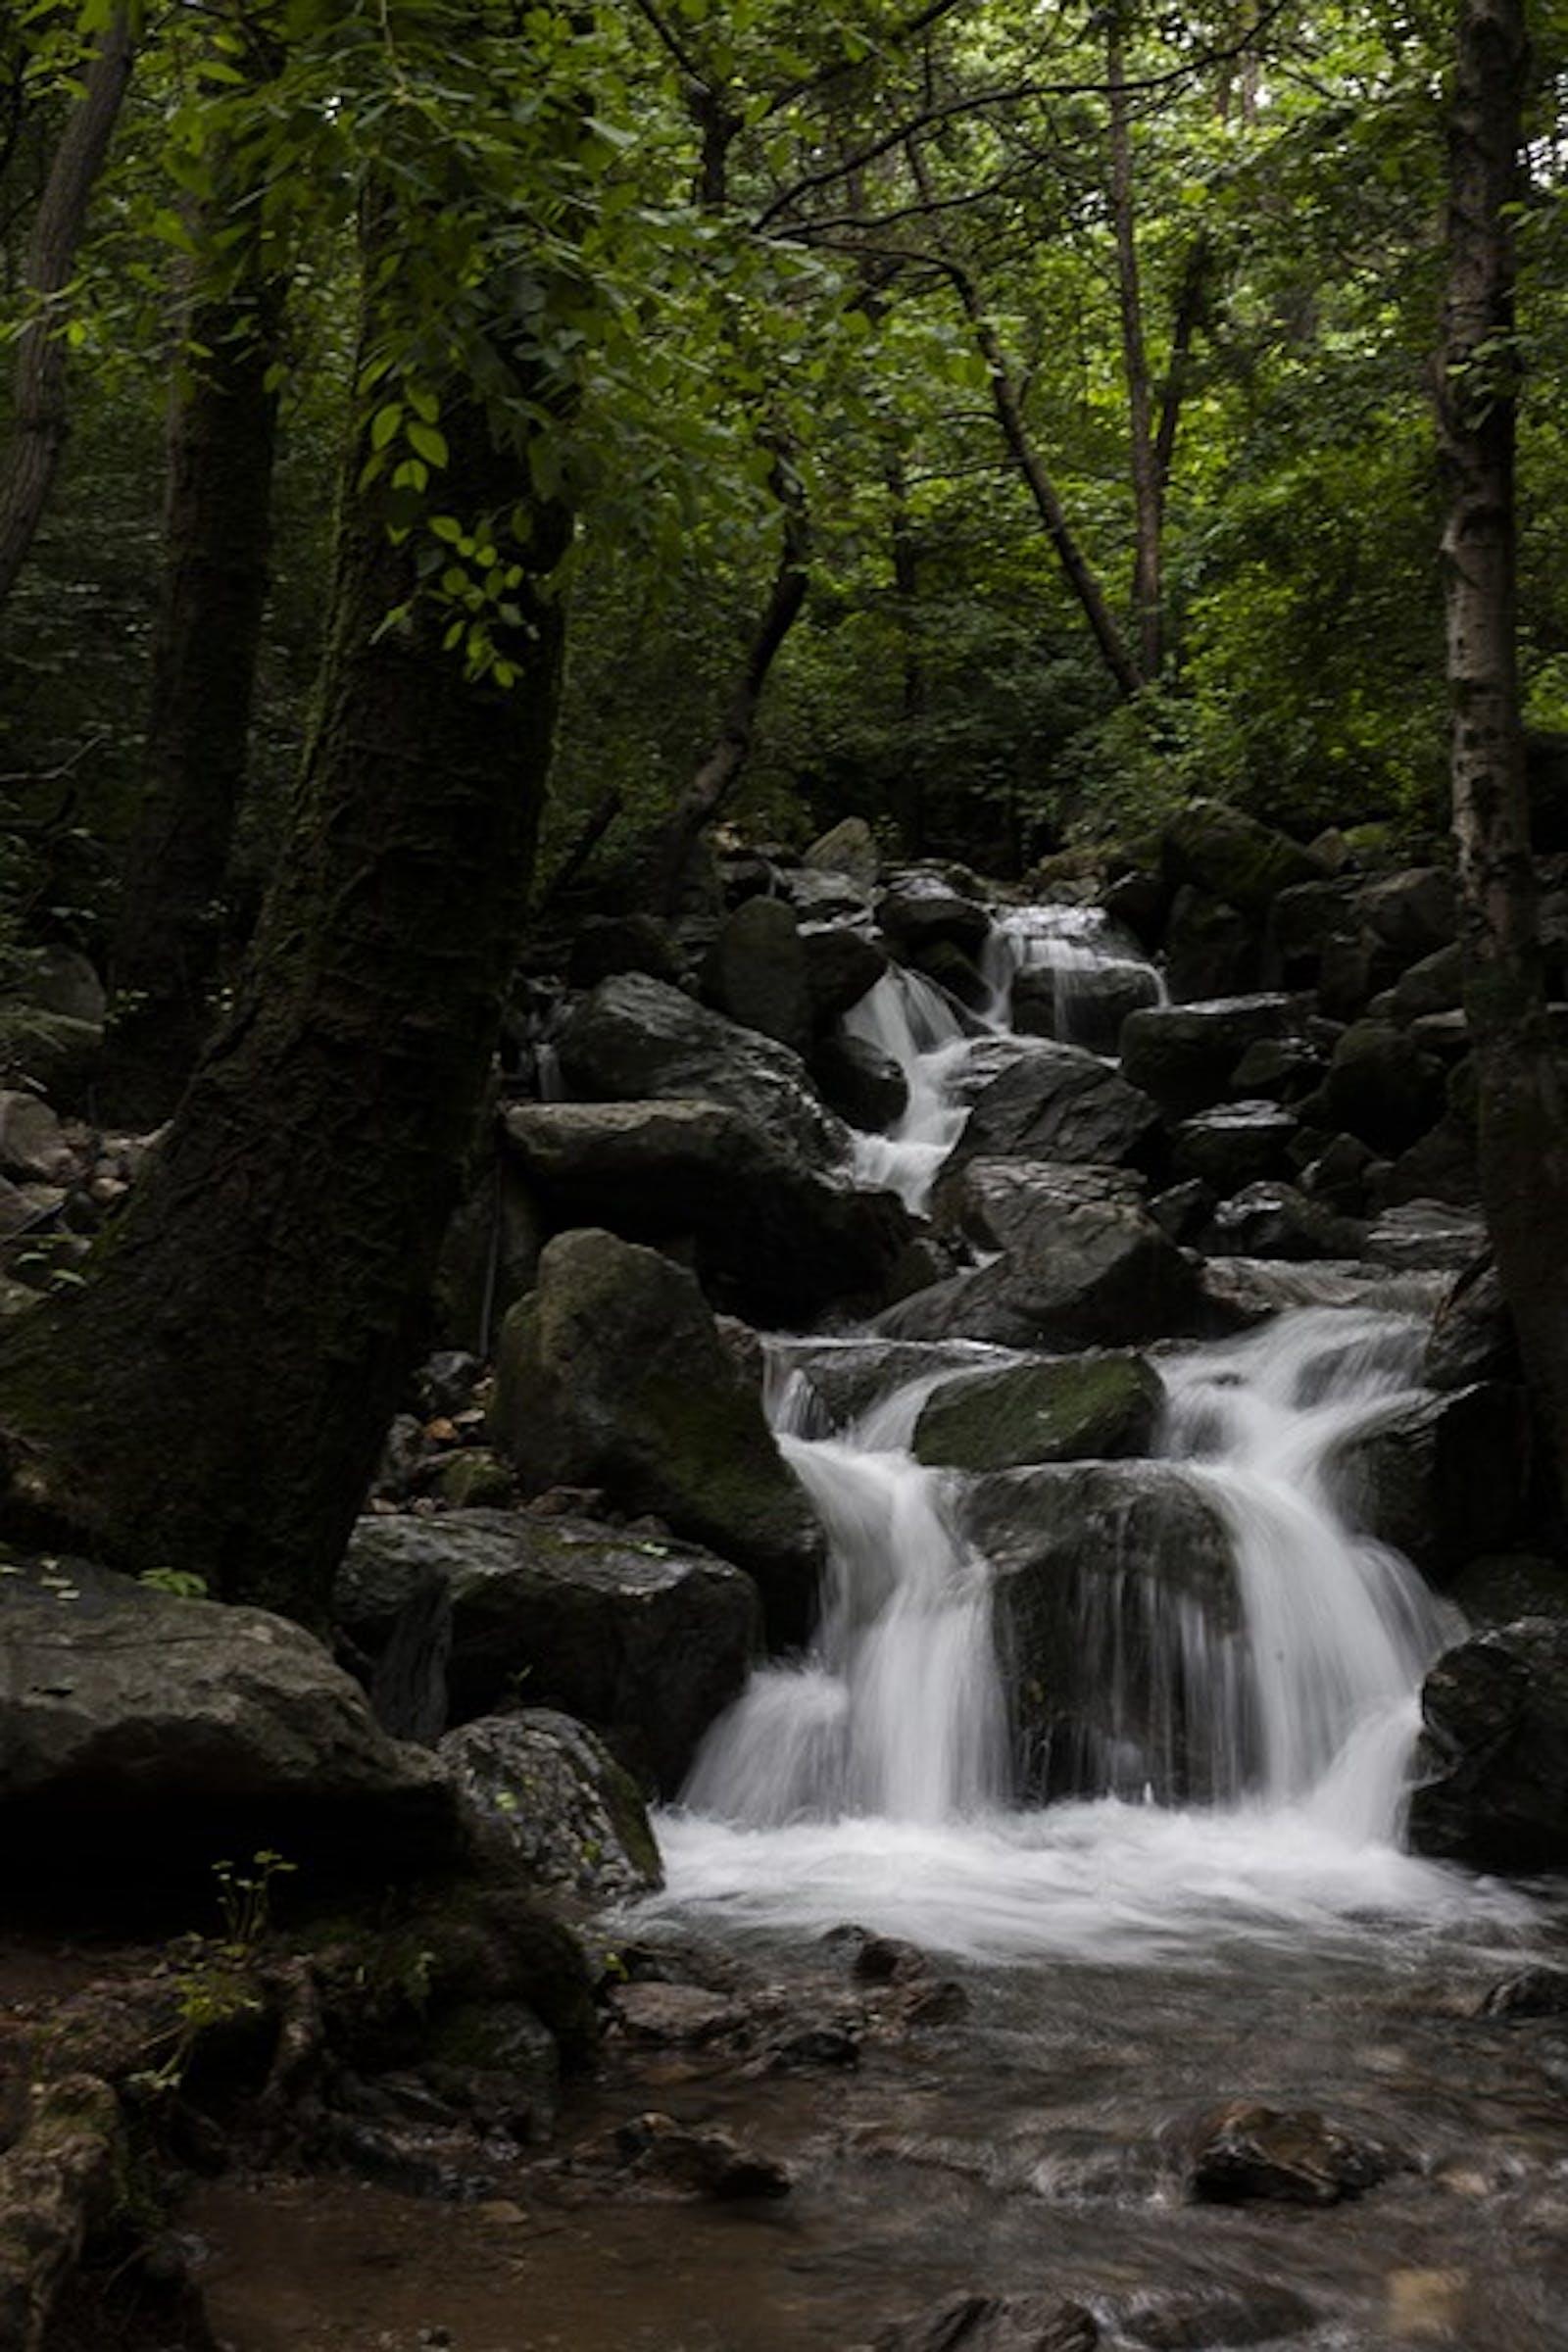 Central Korean Deciduous Forests